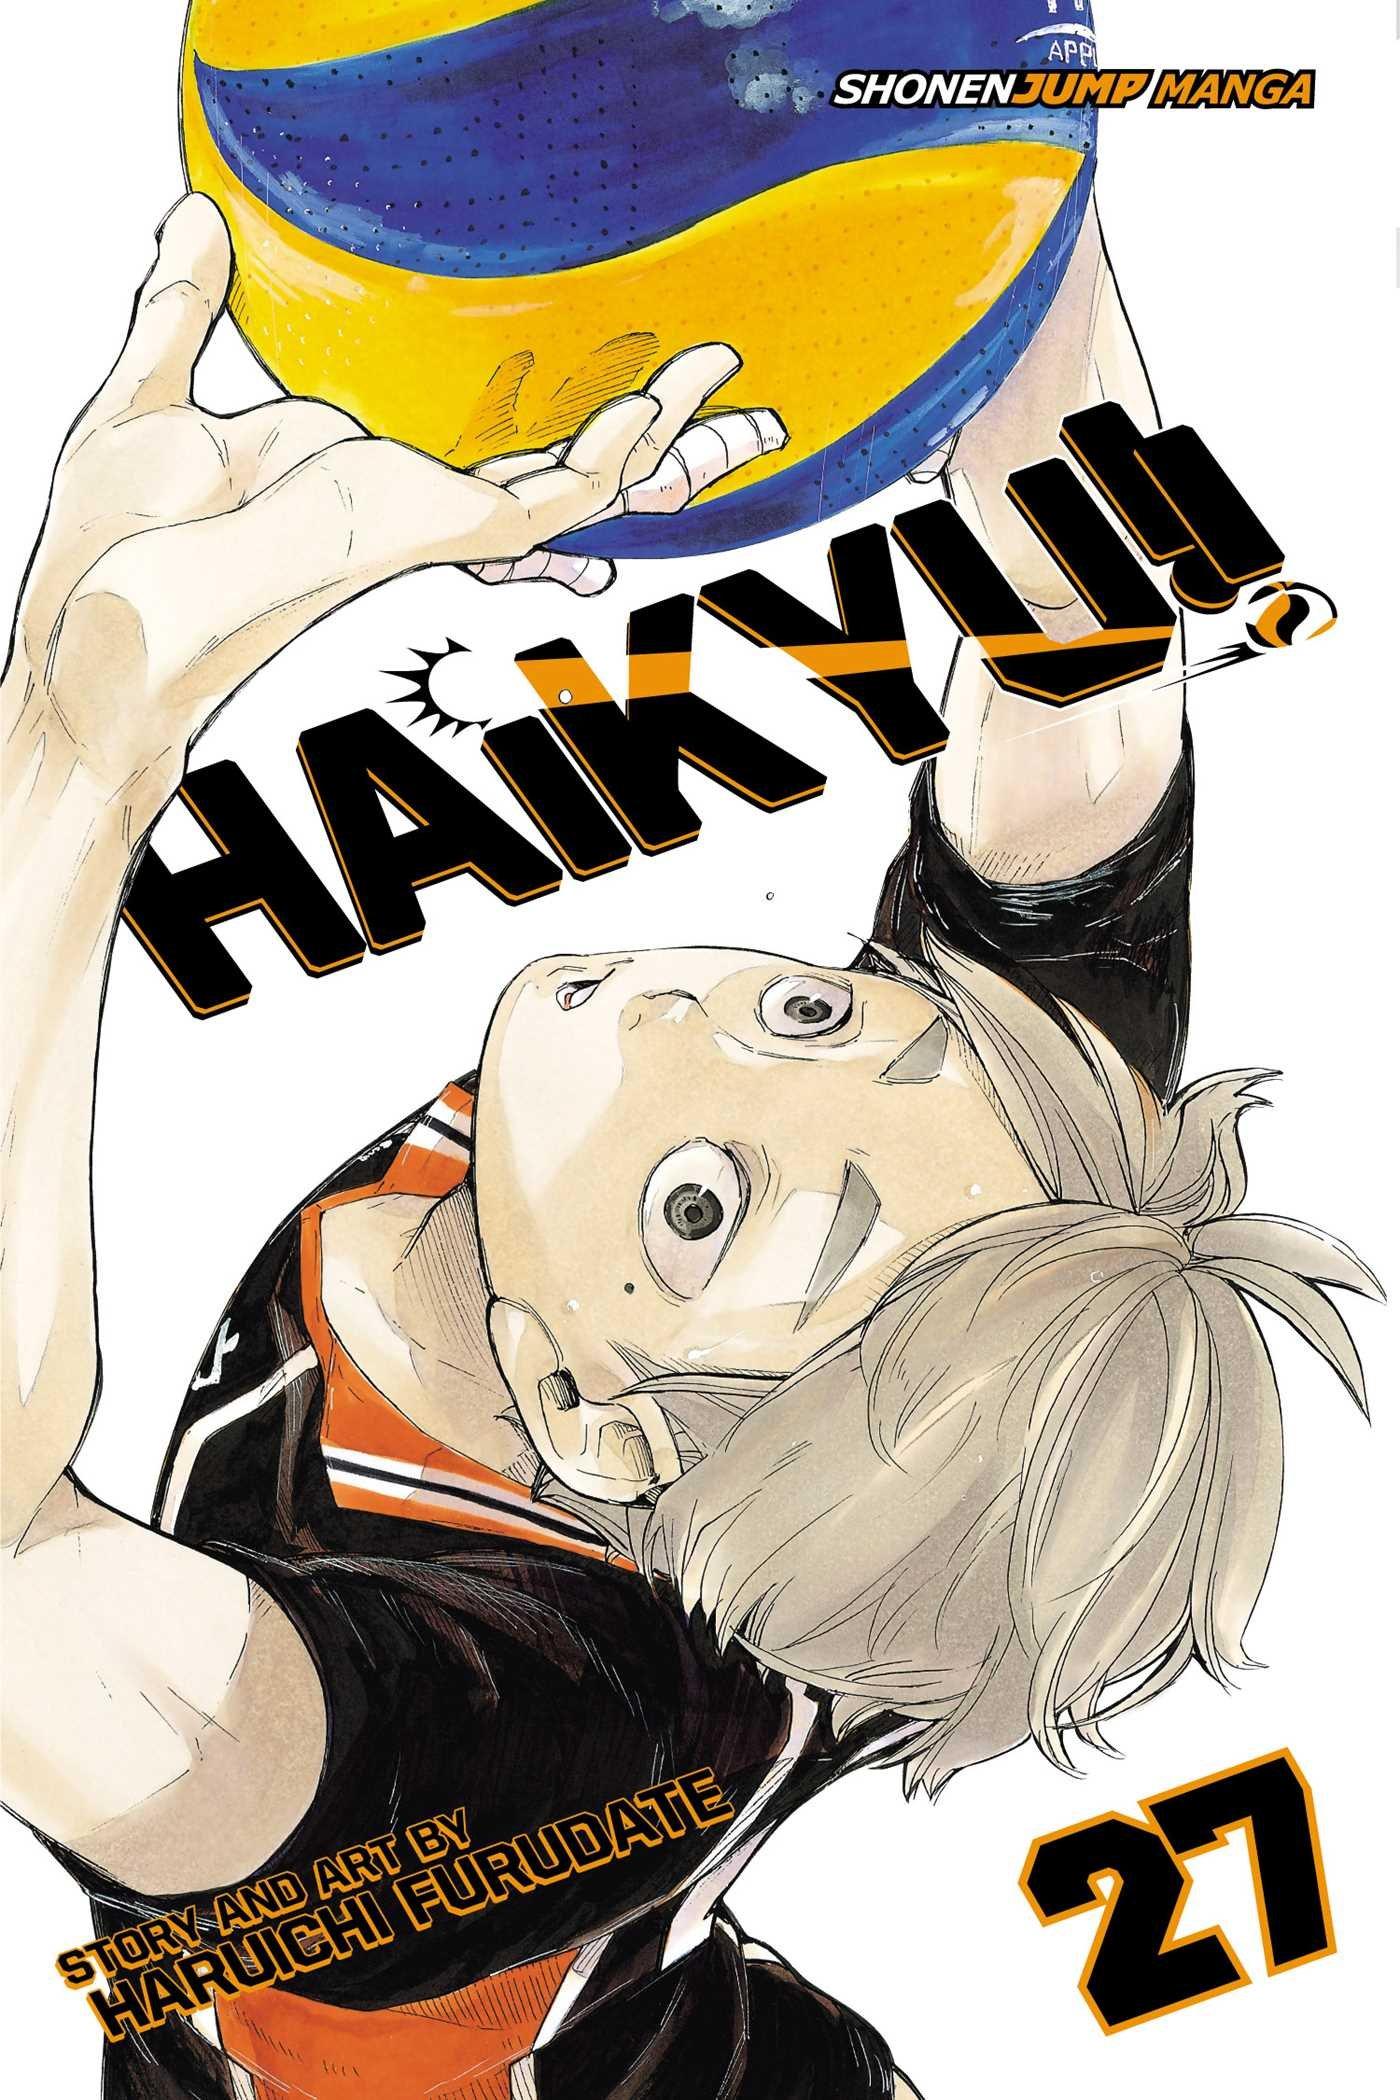 Haikyu!! - Tomo 27 - Haruichi Furudate - Manga ( Ingles)